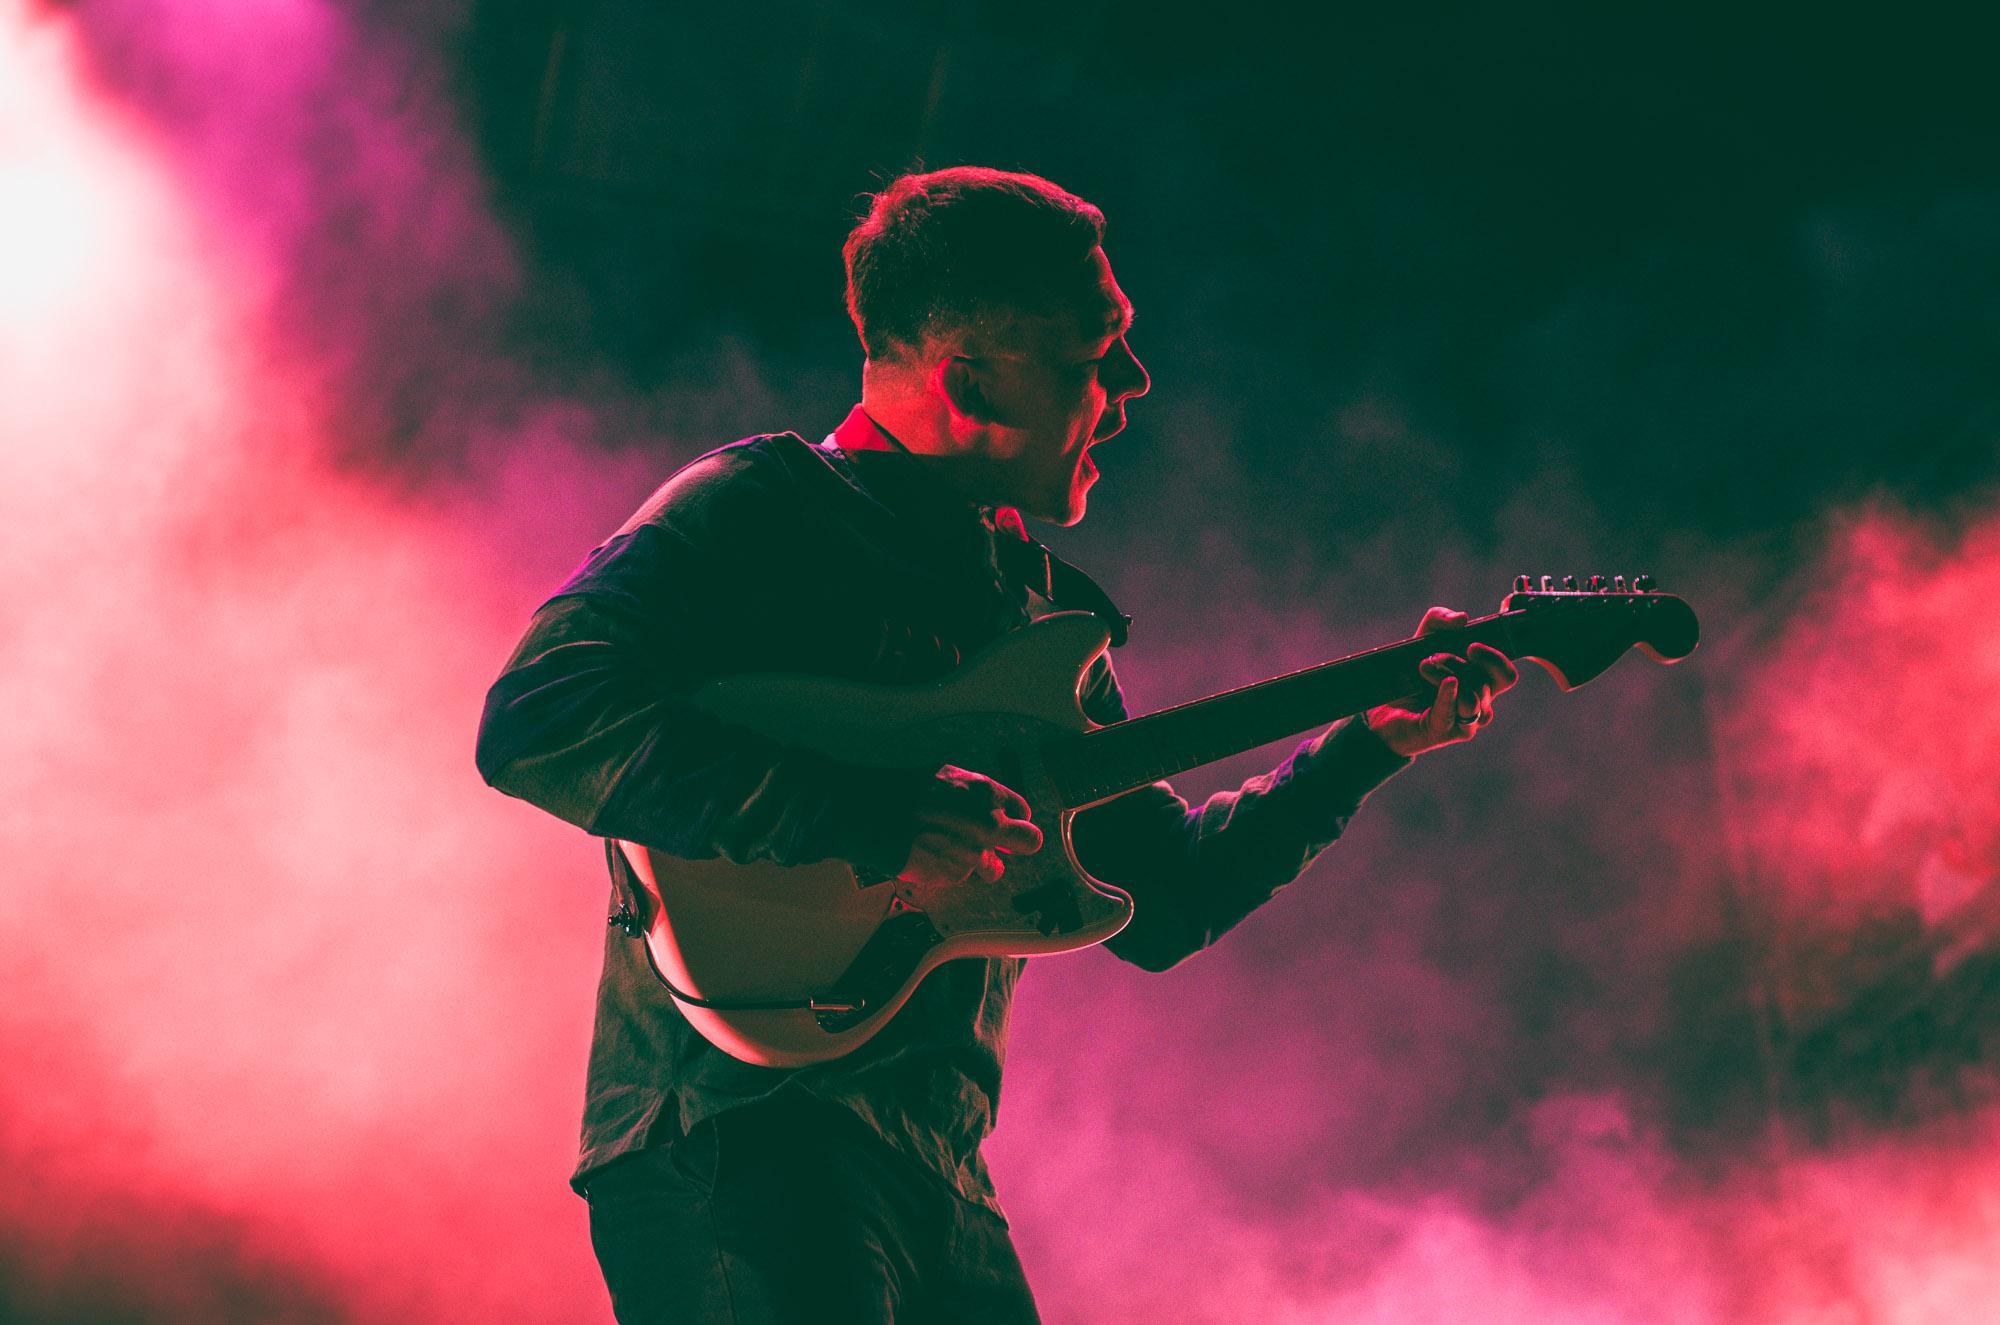 Riptide Music Festival - Dec 2nd 2017 //Fort Lauderdale Beach, FLPhotos by Stephanie Estrada